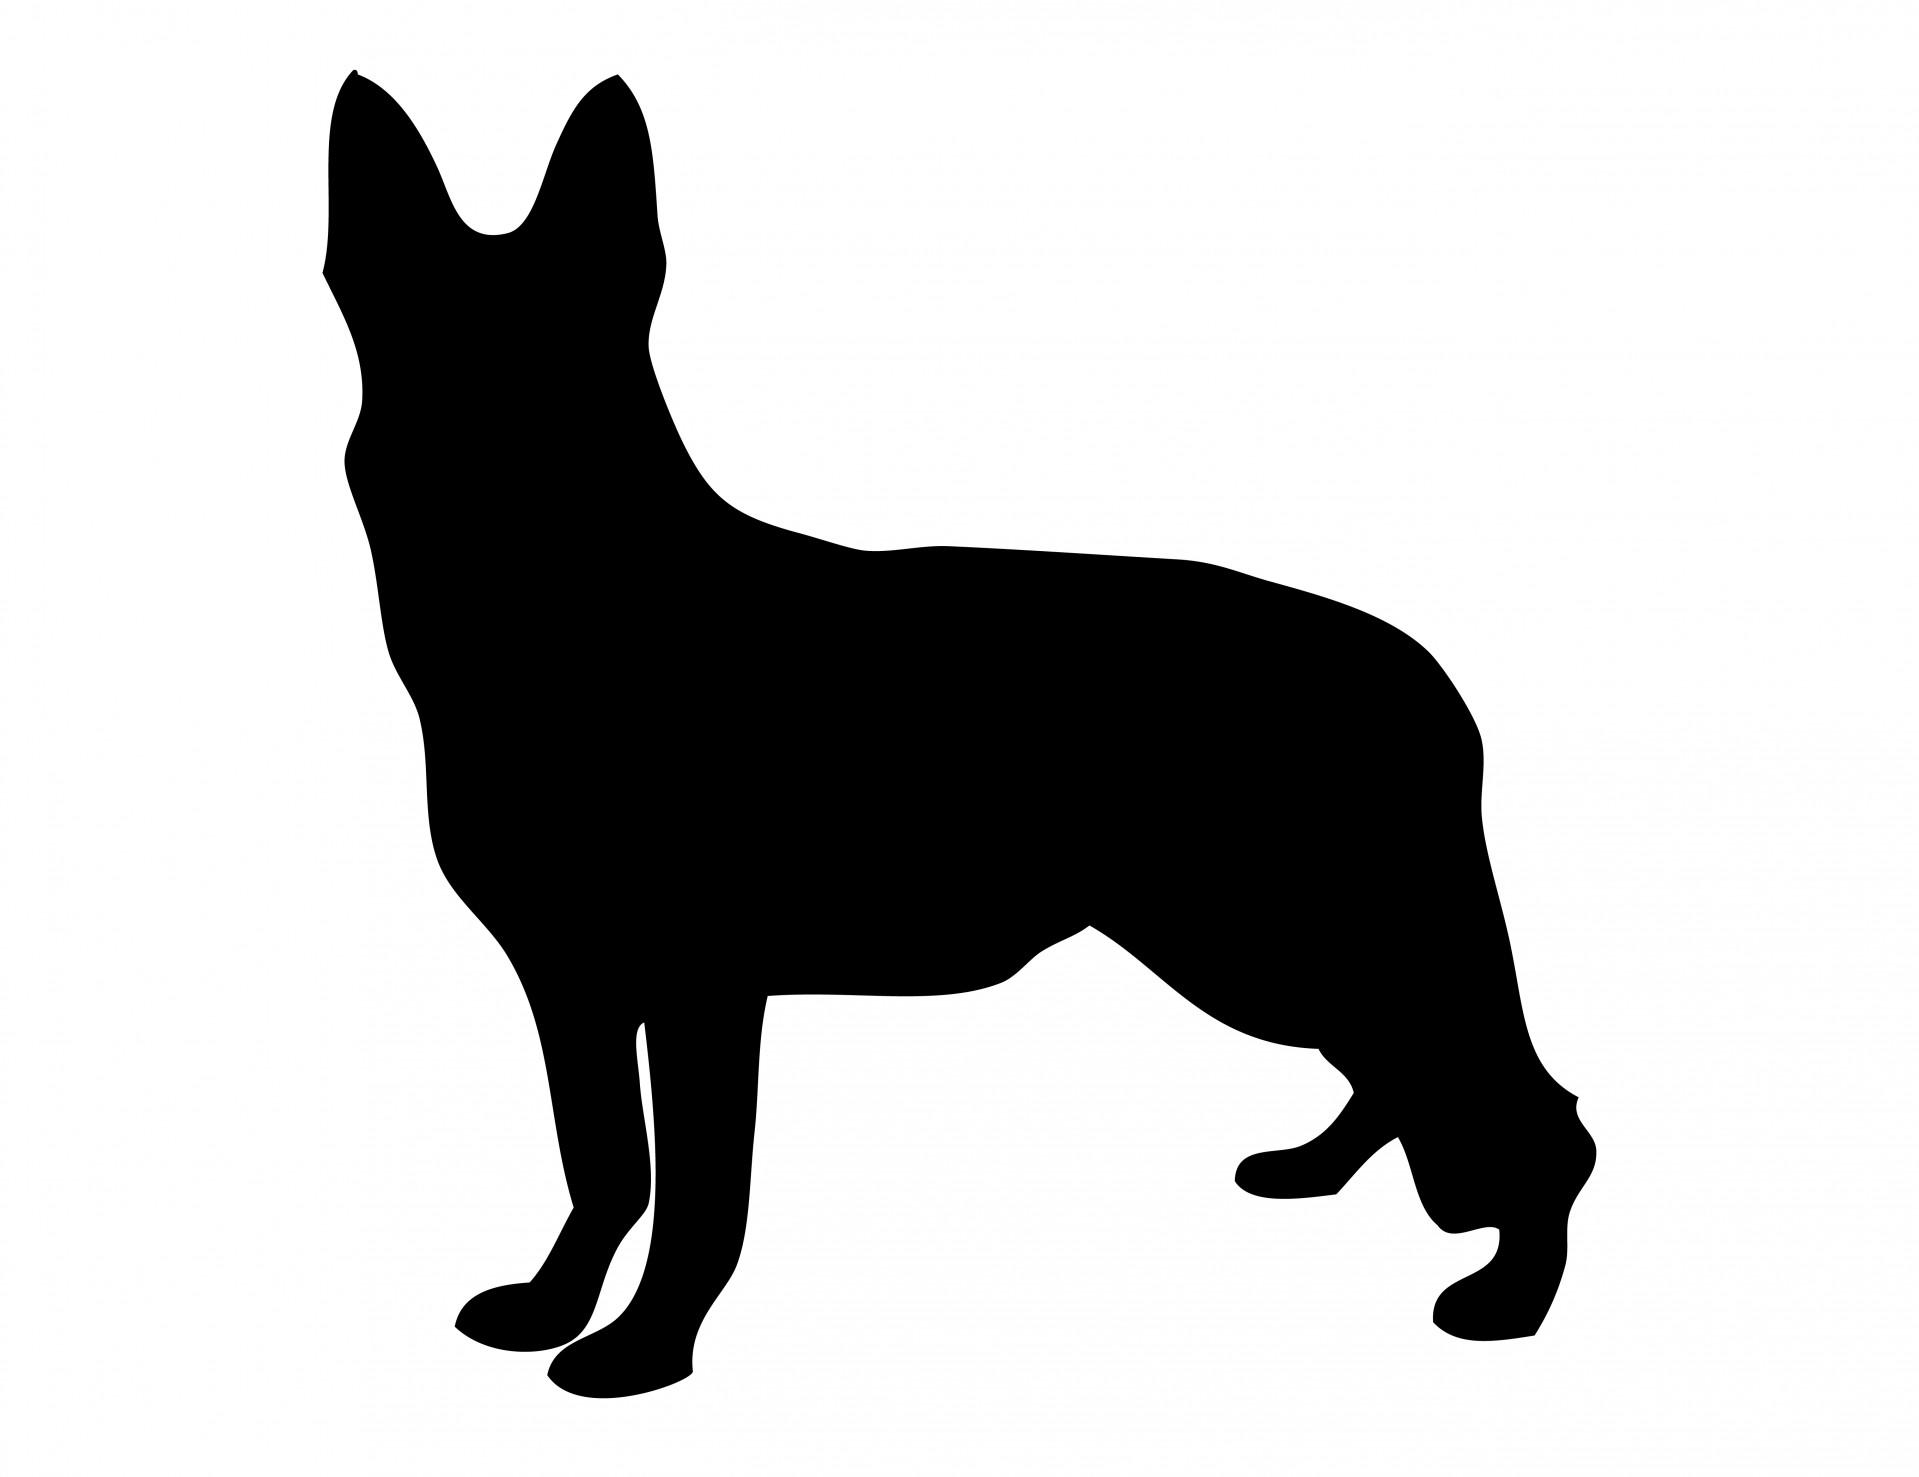 1919x1477 Dog German Shepherd Silhouette Free Stock Photo